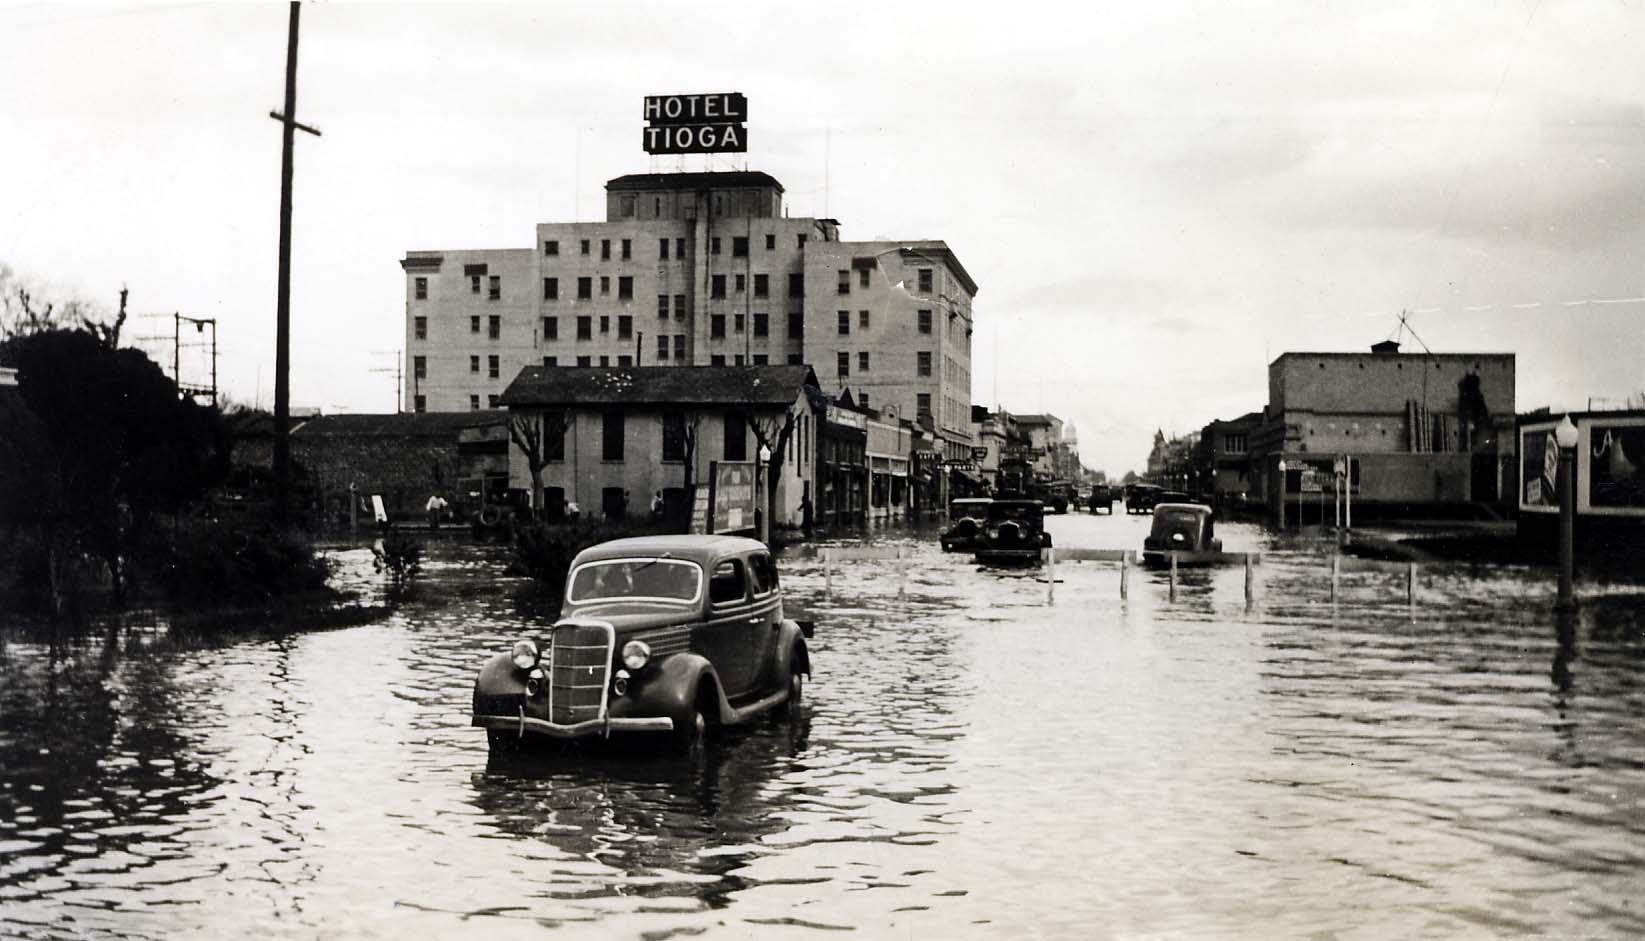 84-63-55 Merced flood, 1935, Main Street looking east.jpg